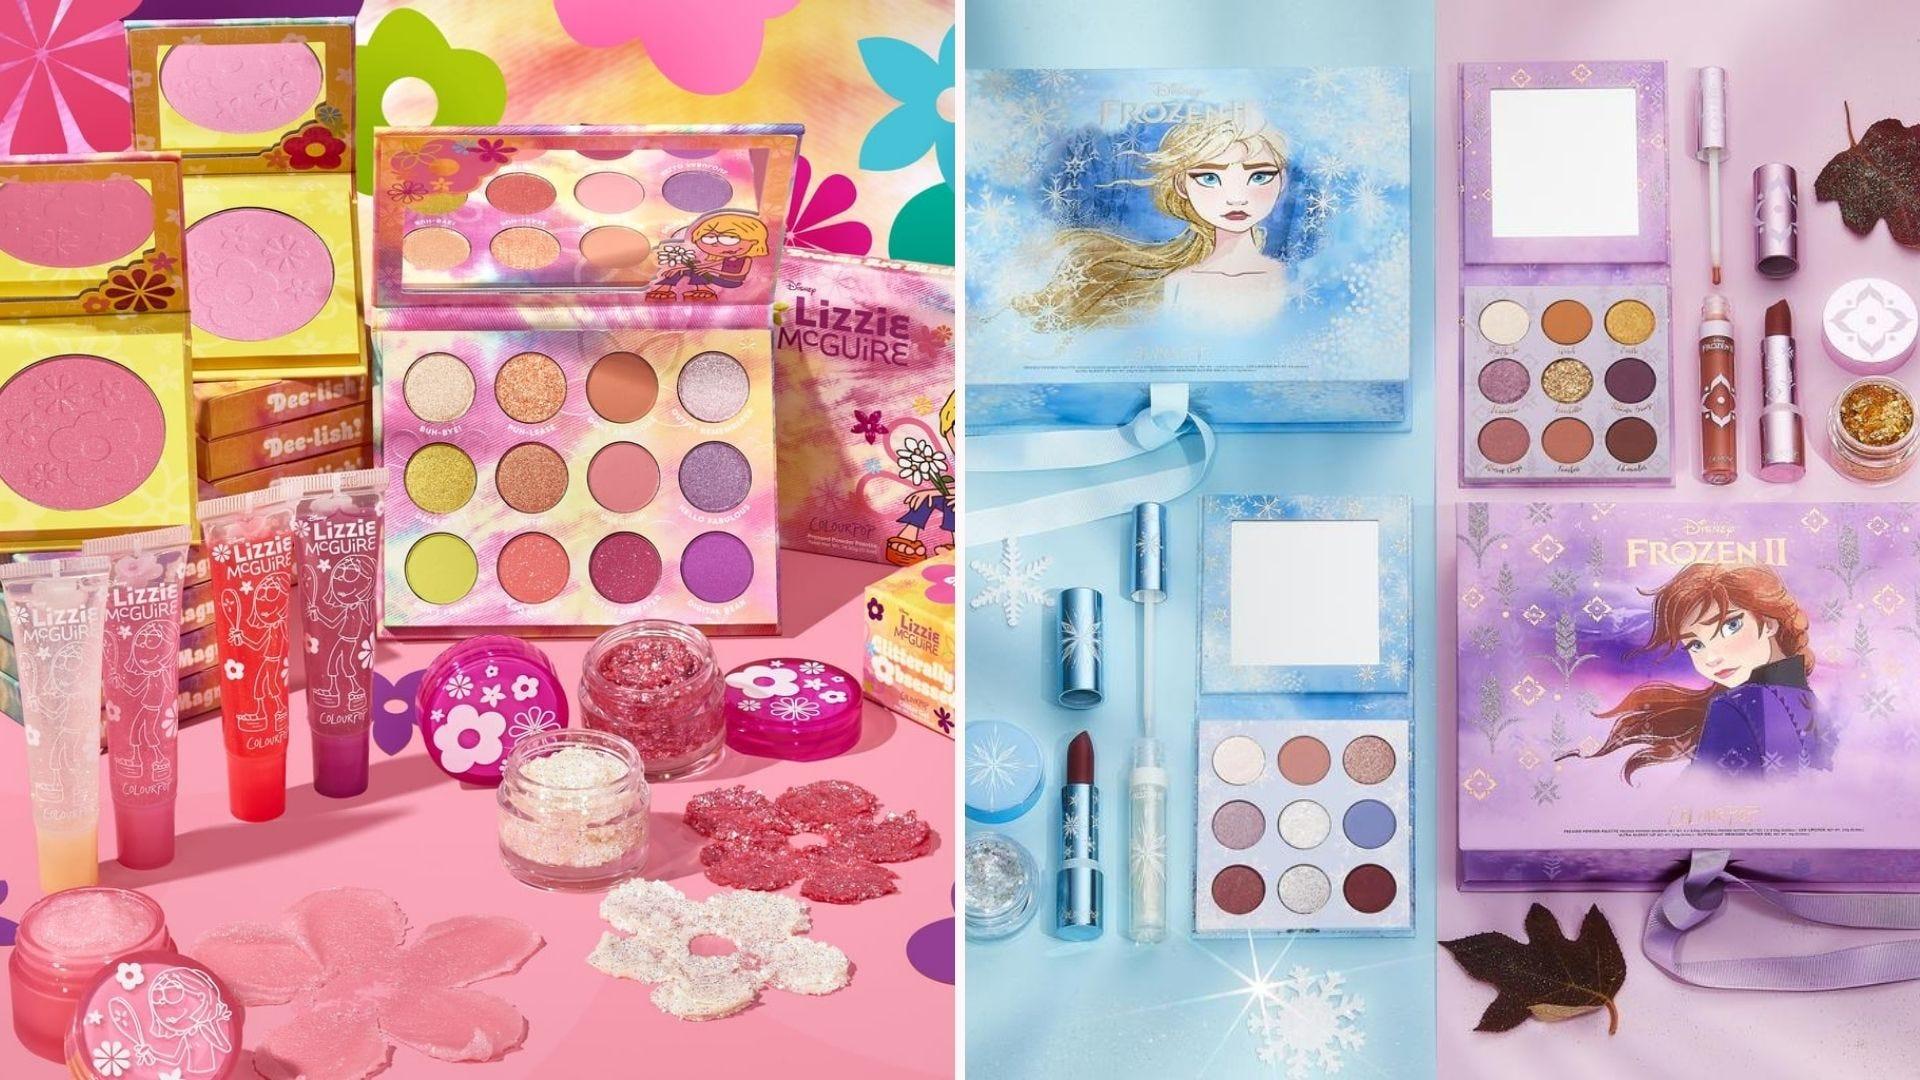 A pink Lizzie McGuire themed makeup kit; a blue and purple Frozen themed makeup set